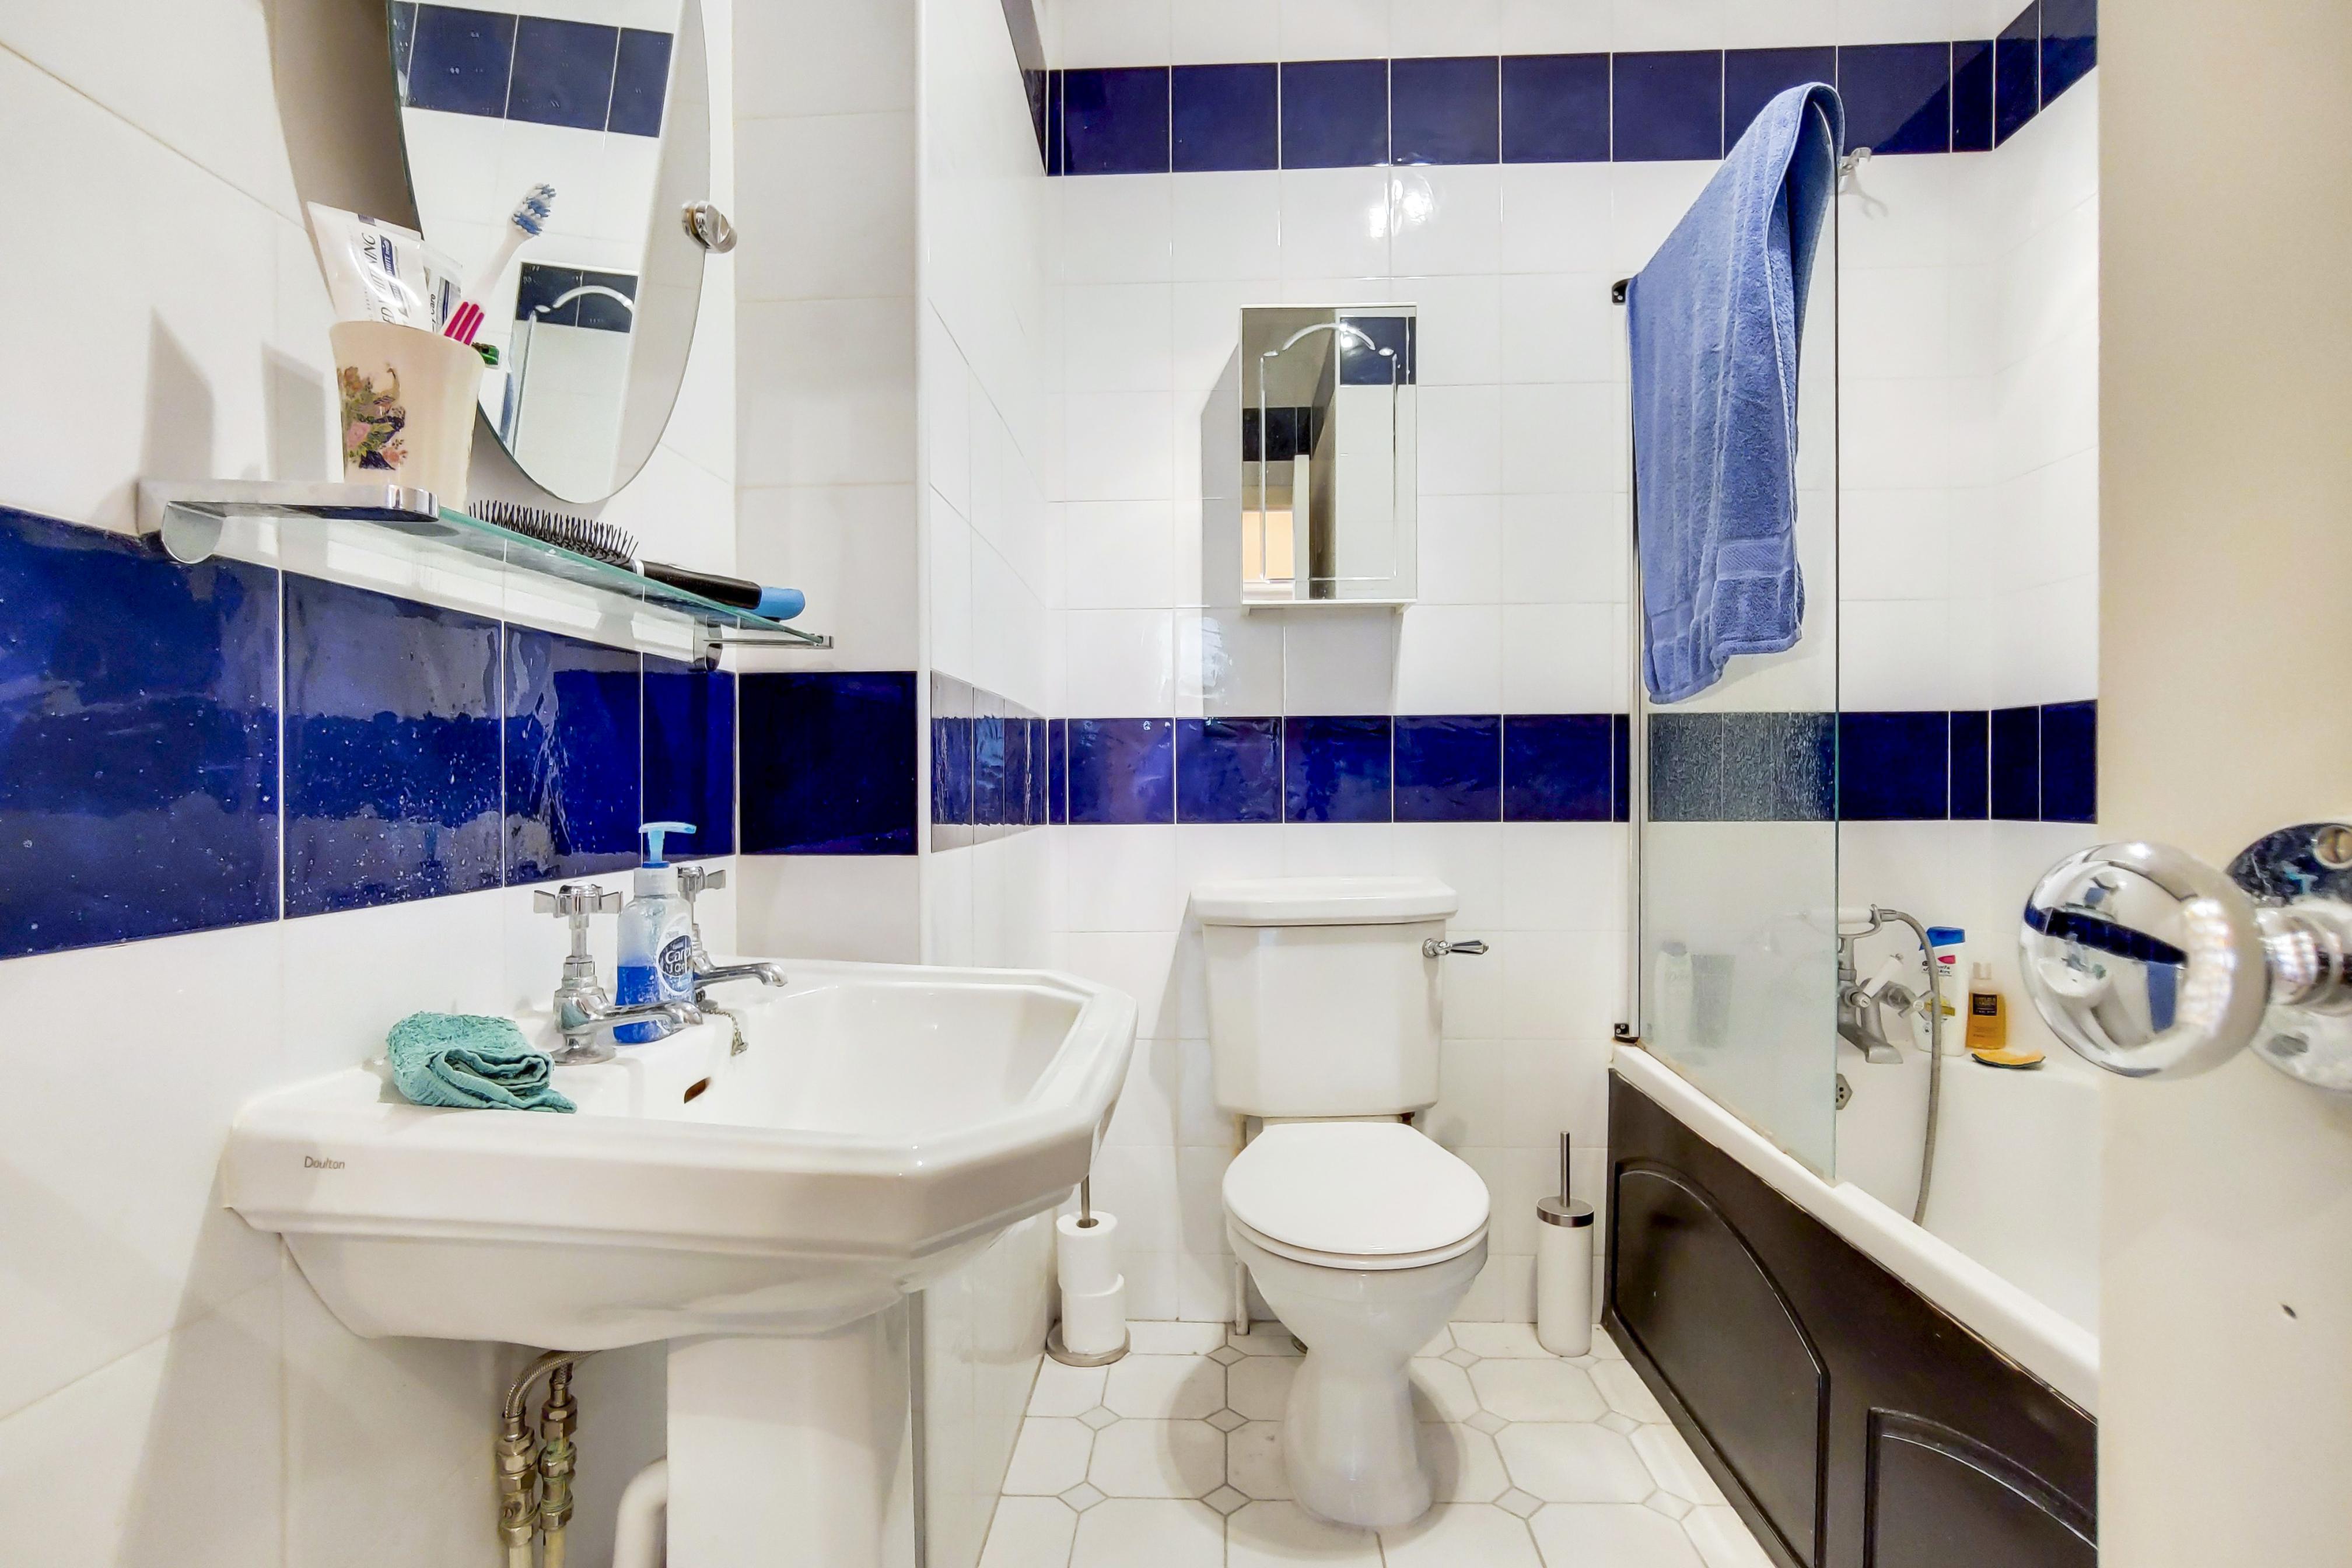 customer_1/branch_2/client_43164/sale_property/5_Bathroom_0_1592320585.jpeg